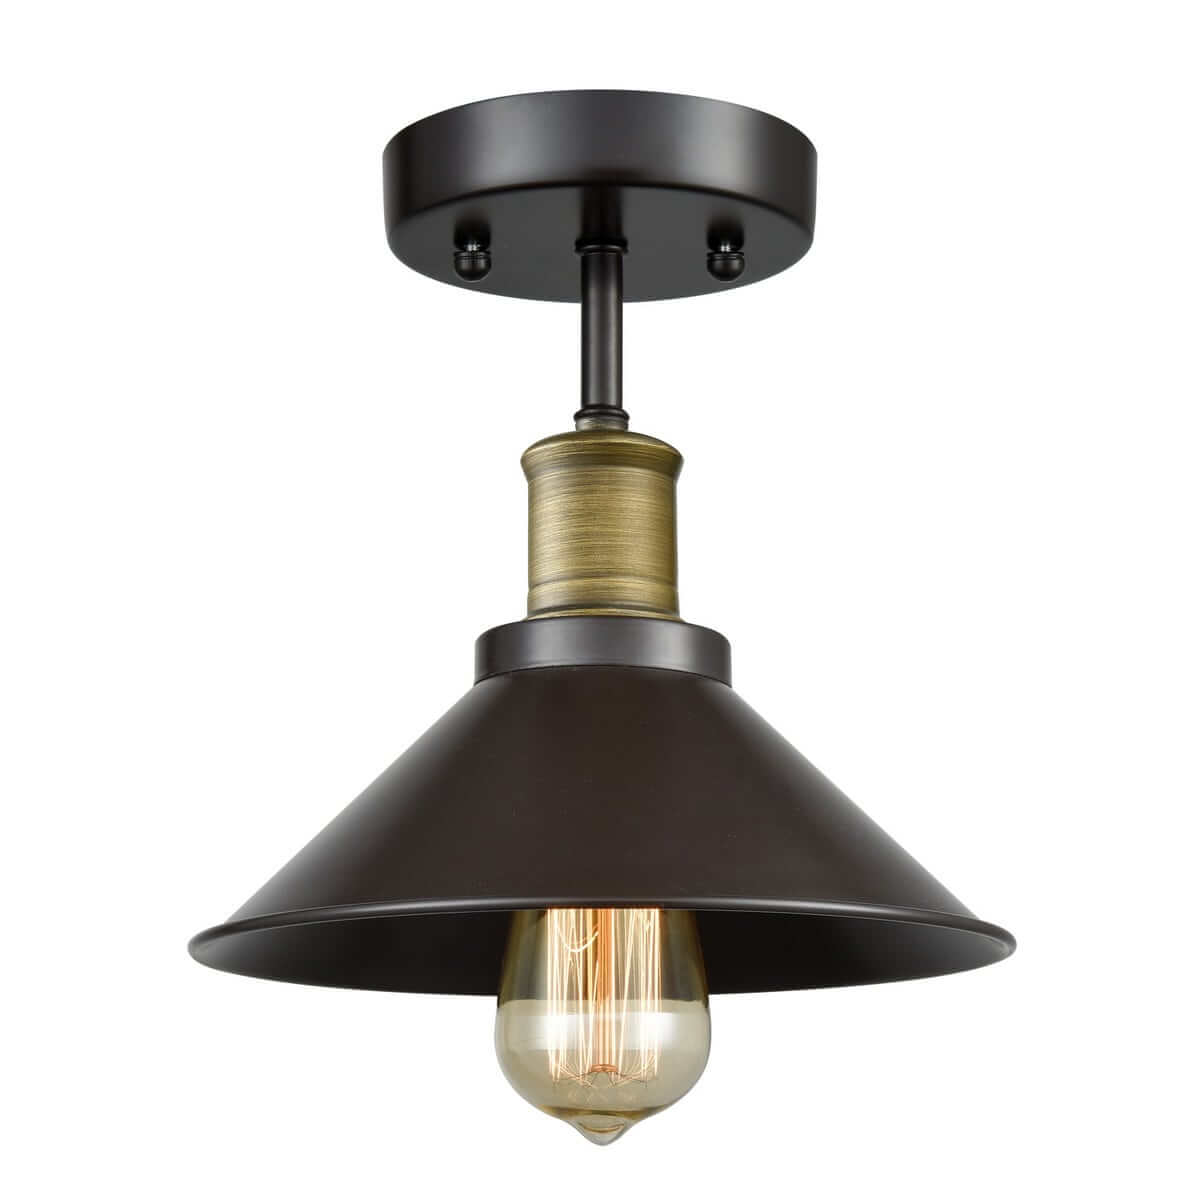 Industrial Mini Bronze Ceiling Light 1 Light Cone Shade Fixture